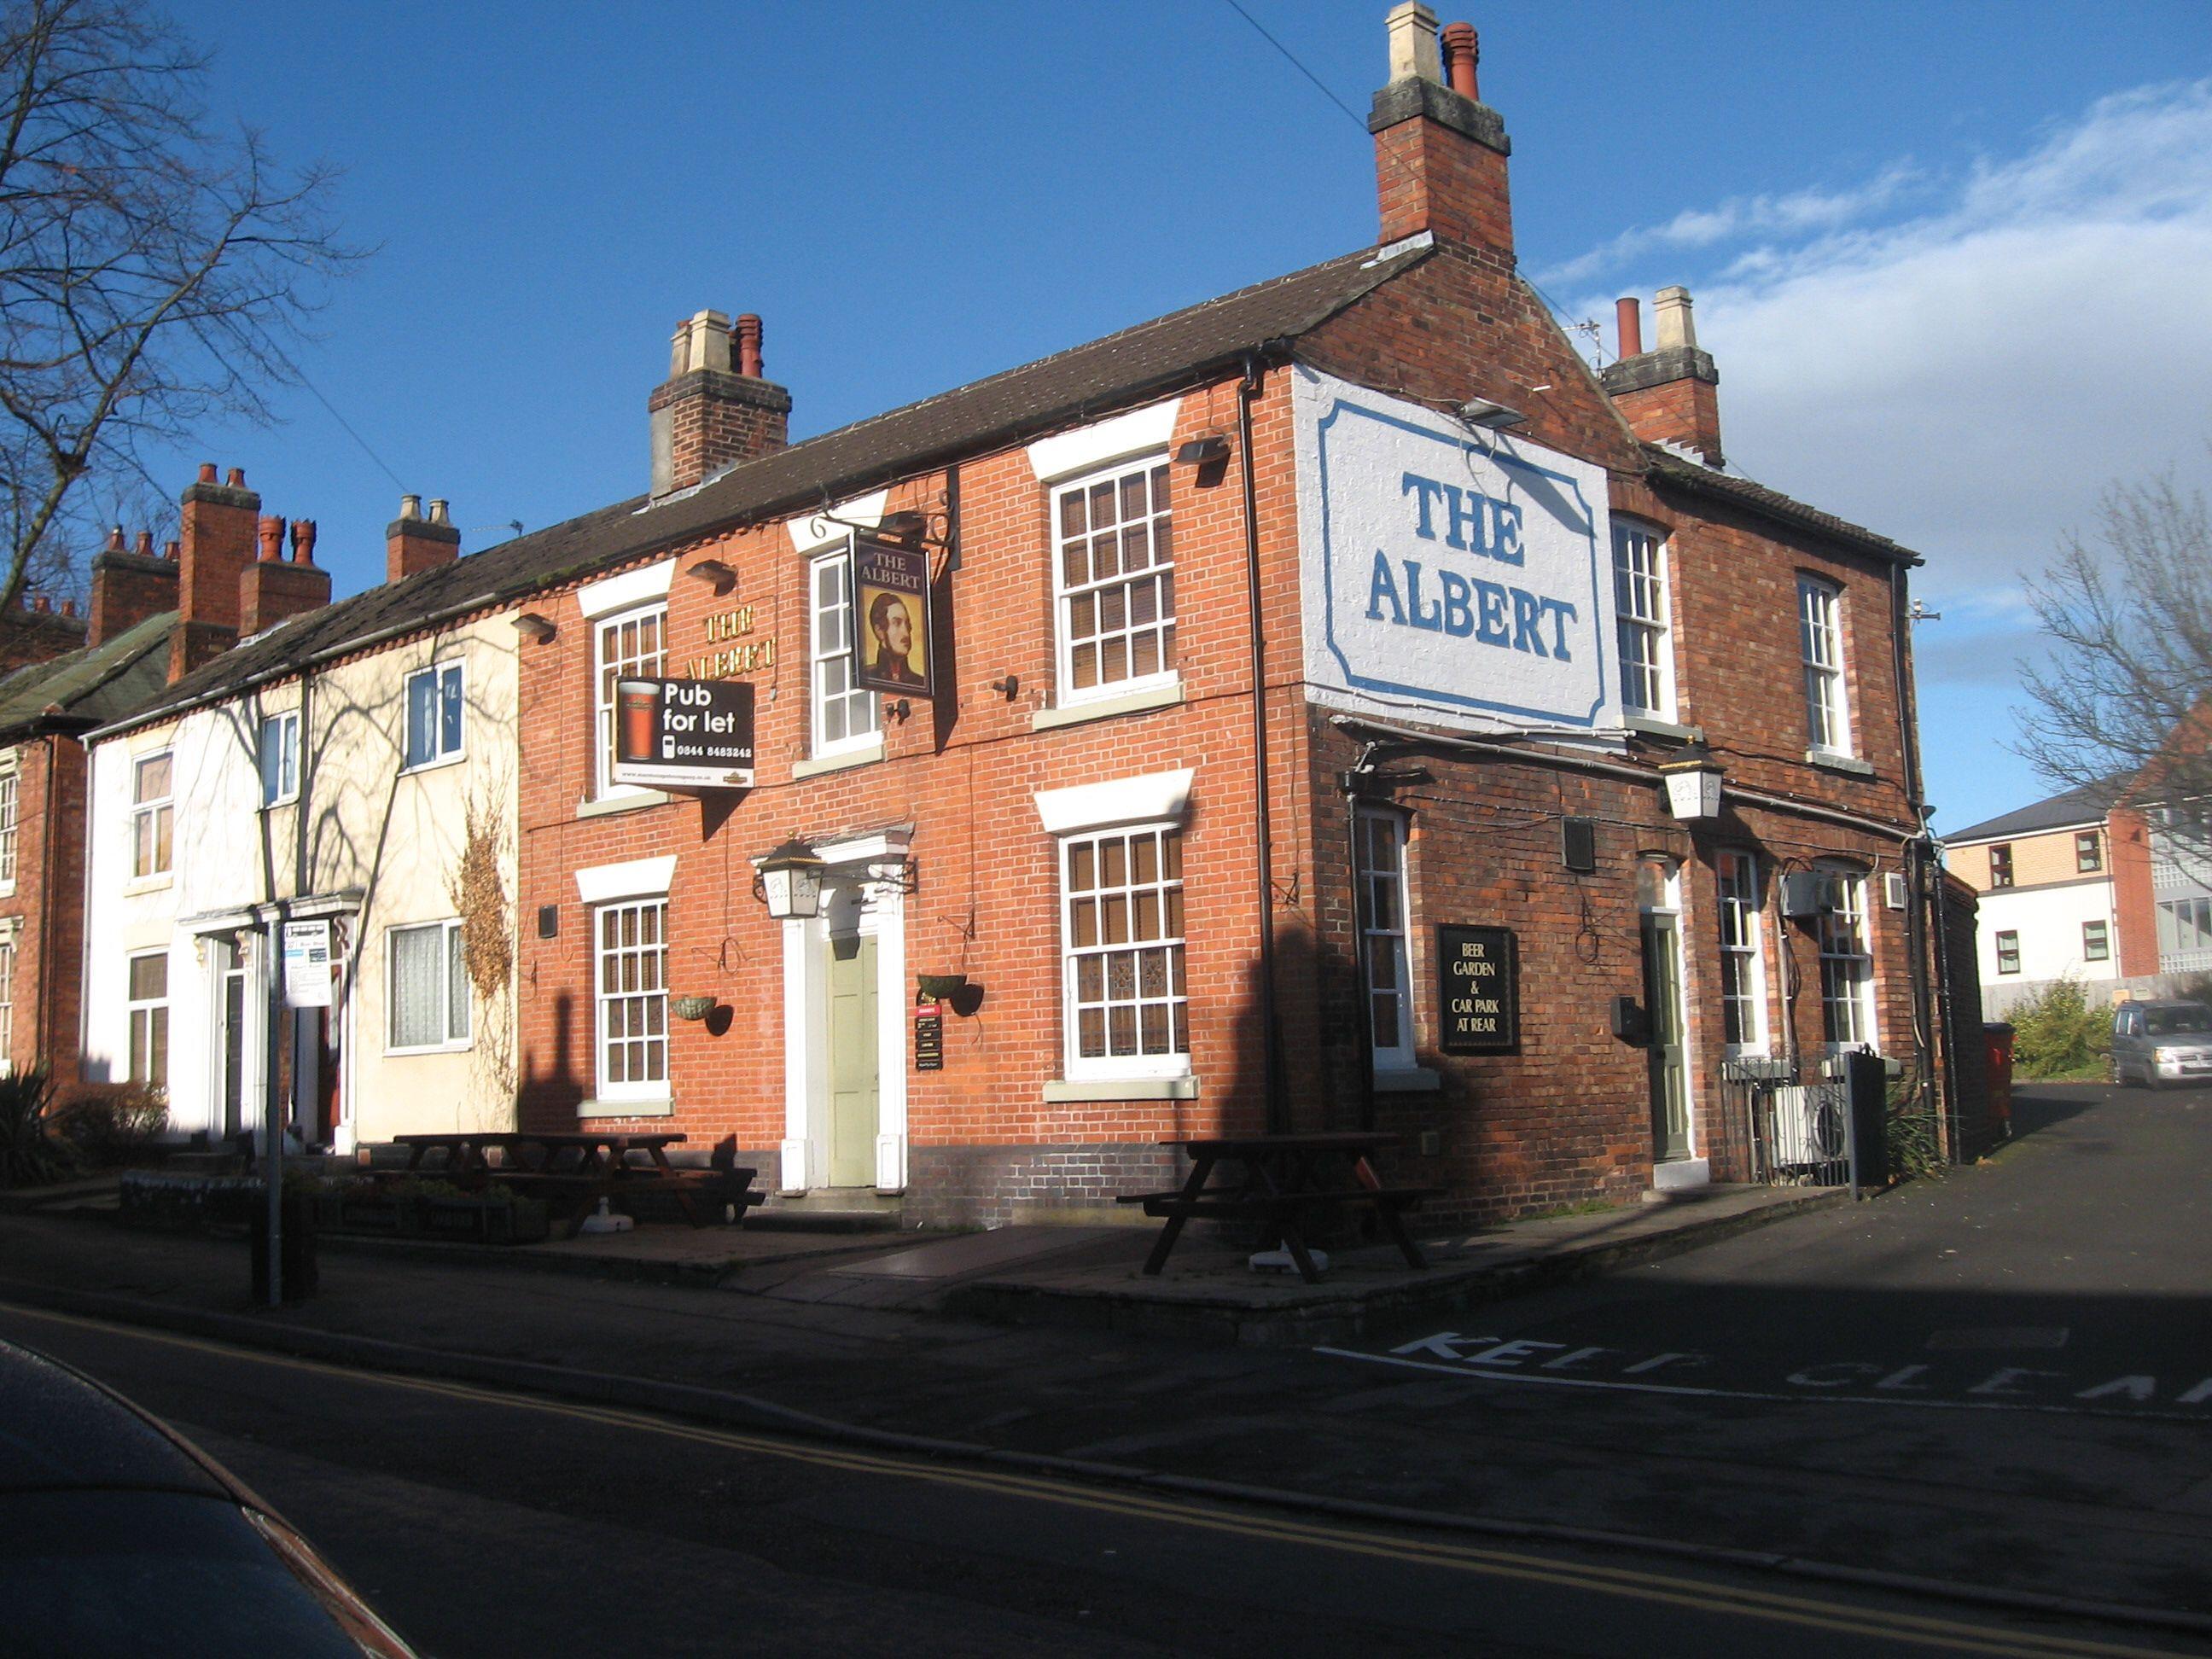 The Albert Hotel Road Tamworth Staffordshire Uk